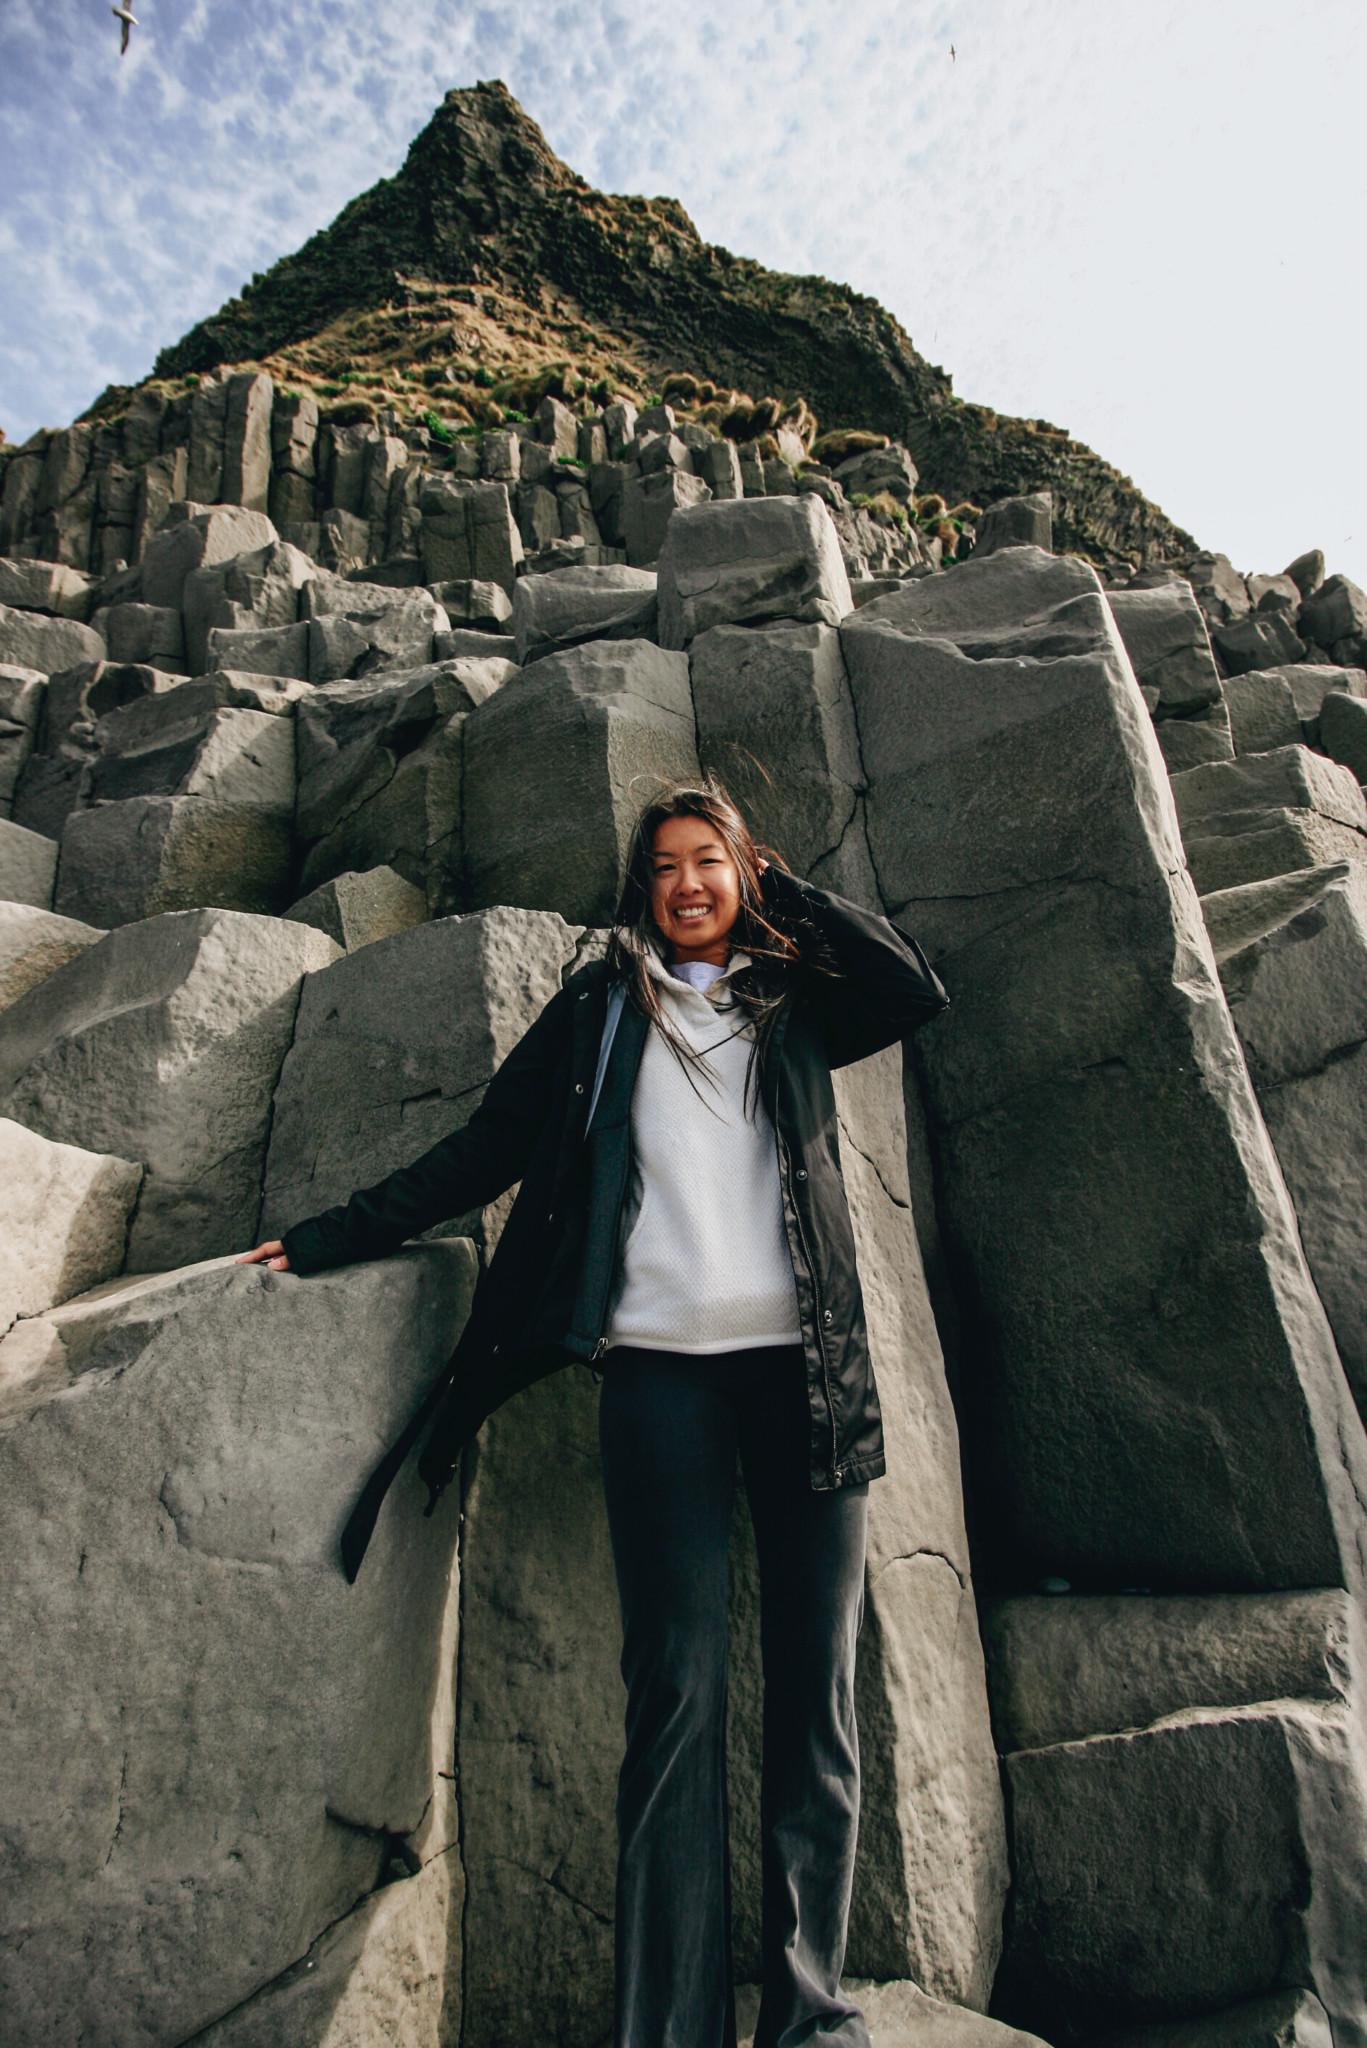 Posing with Basalt Columns on Black Sand Beach in Reynisfjara, Iceland